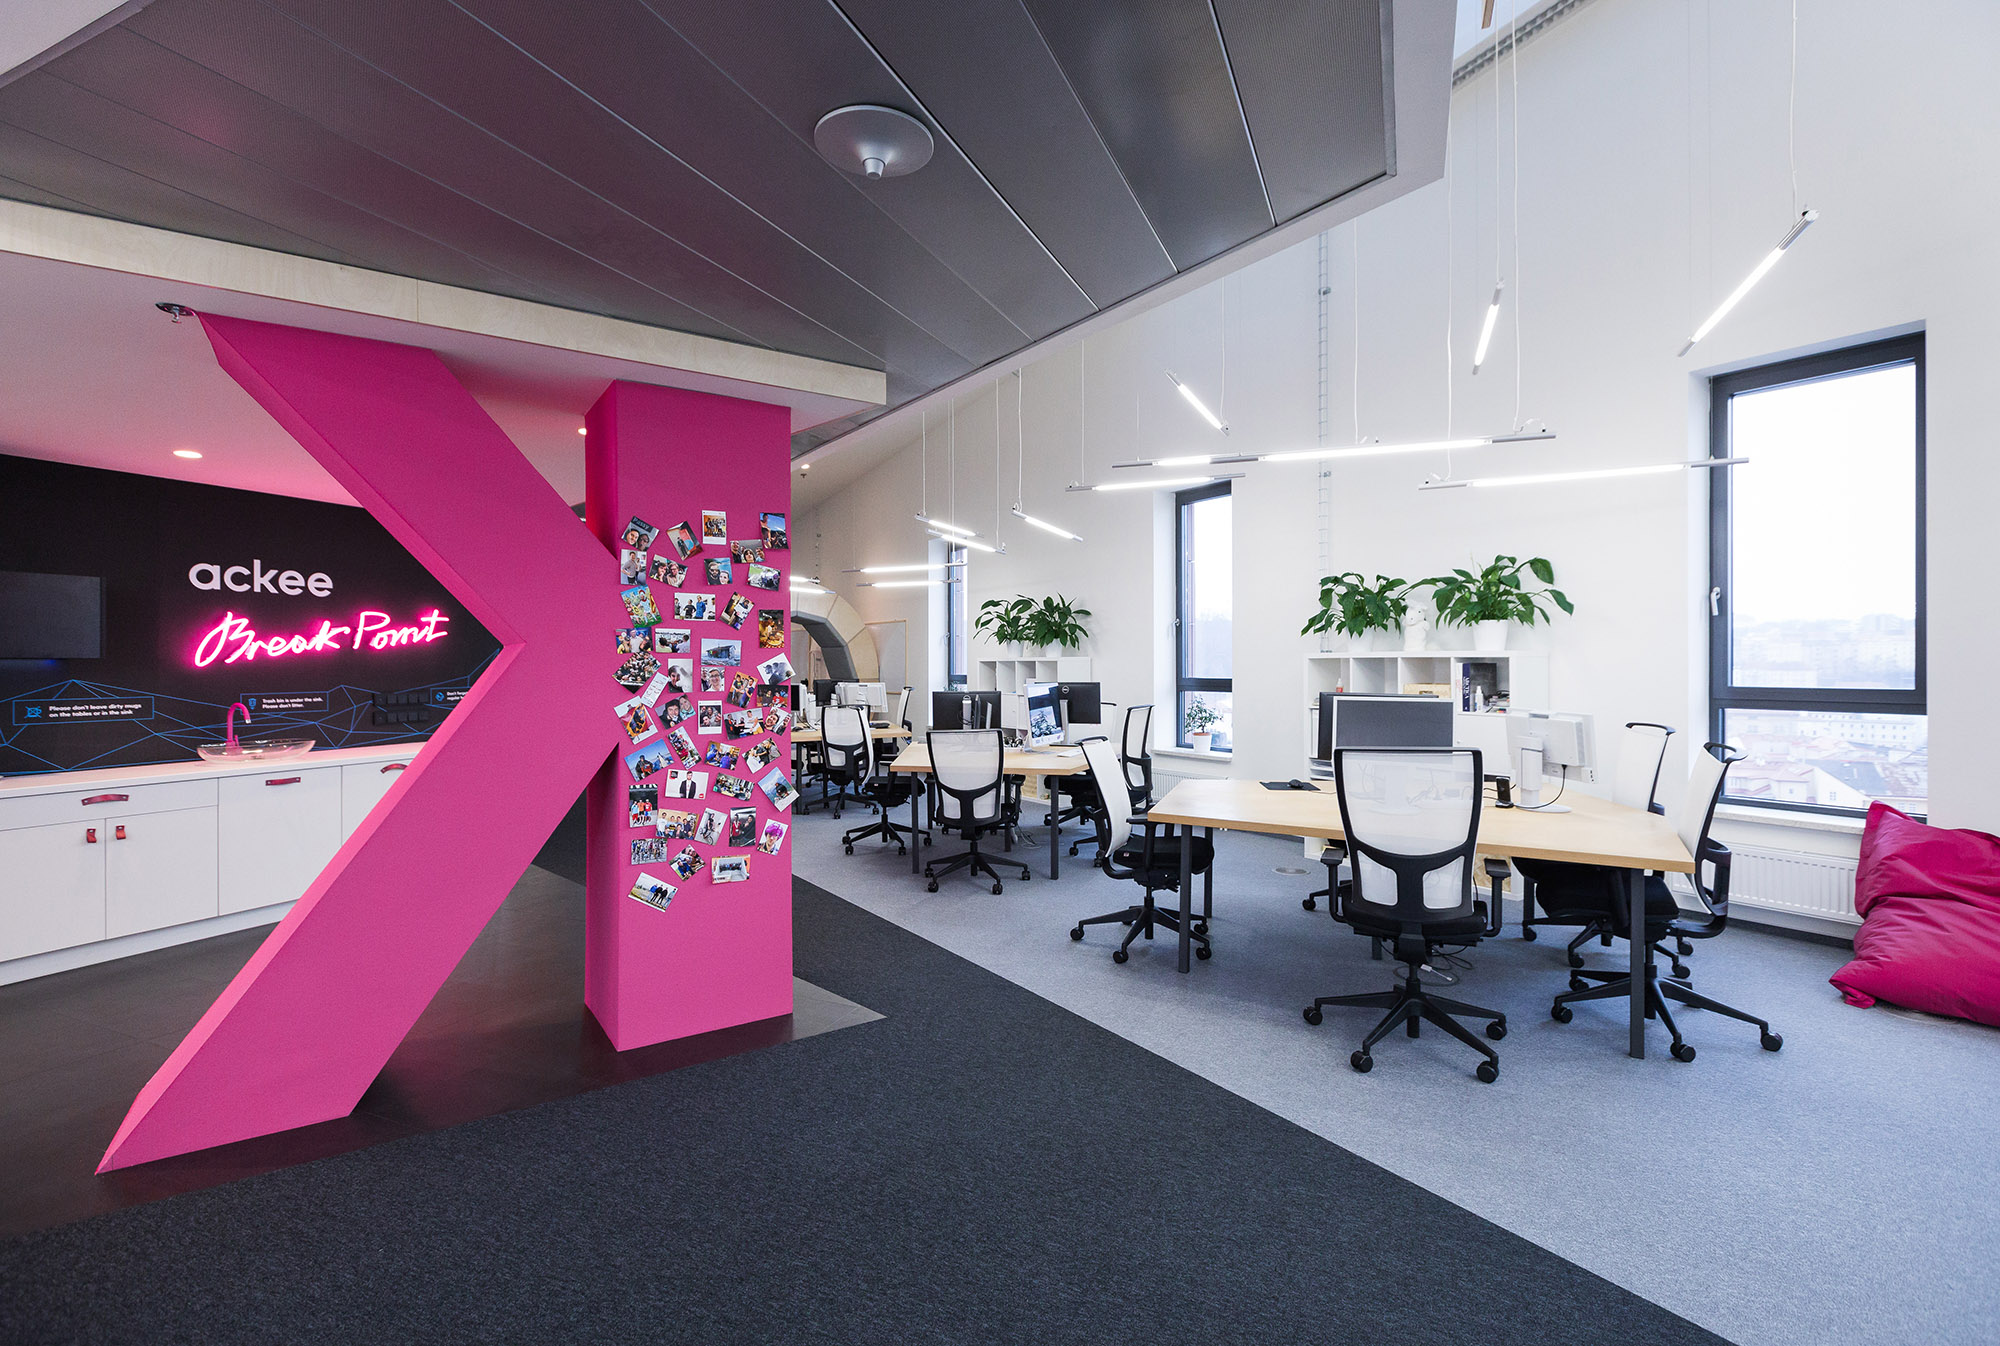 ackee-office-3